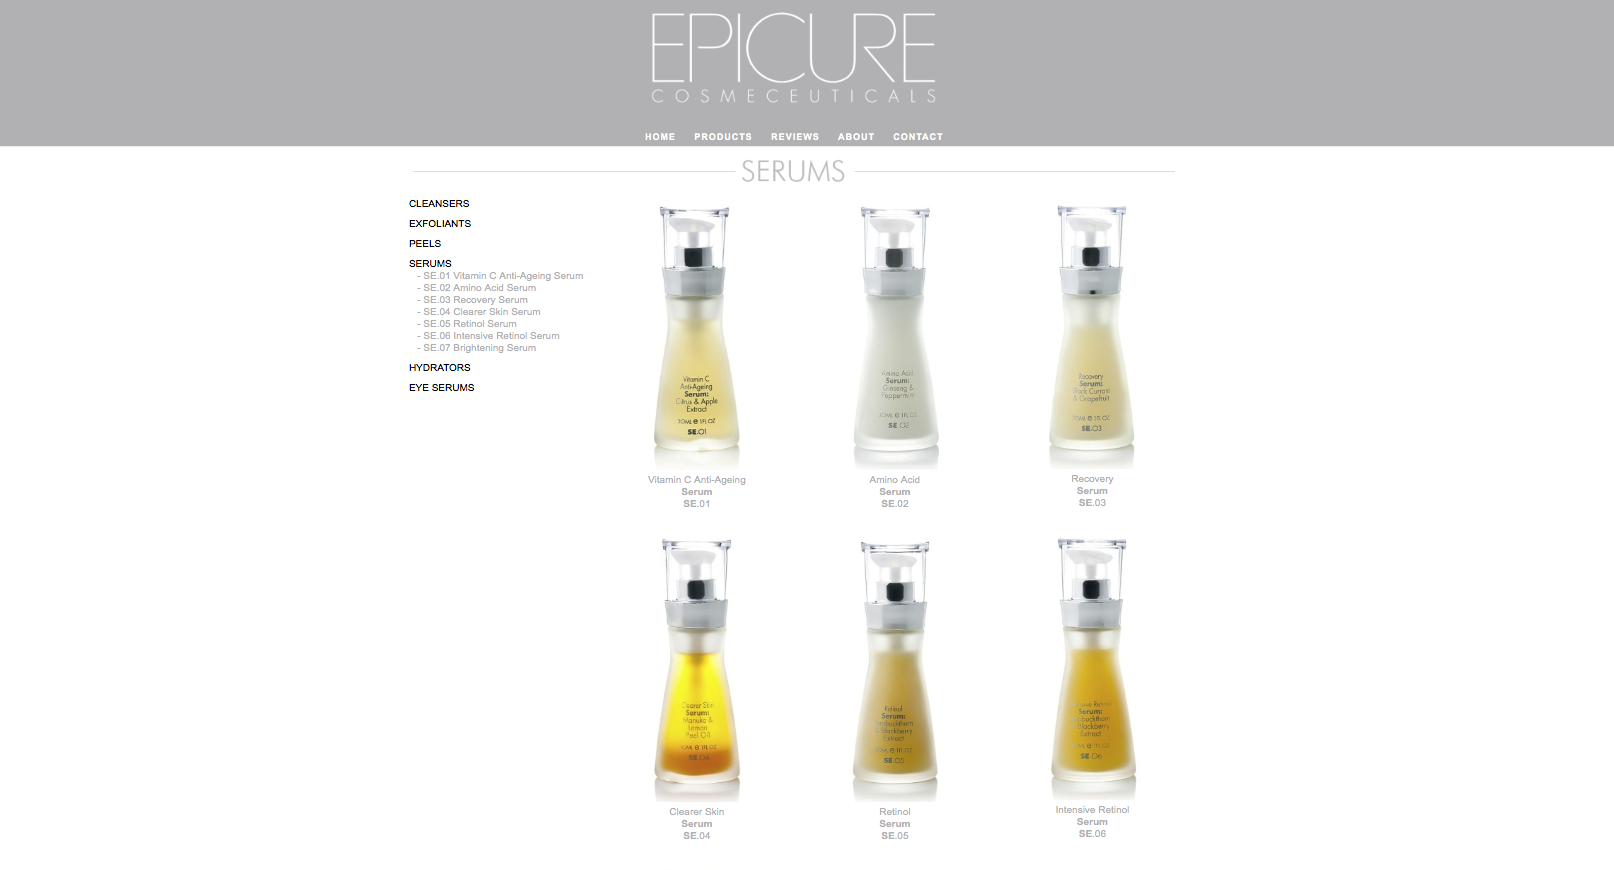 Epicure Cosmeceuticals